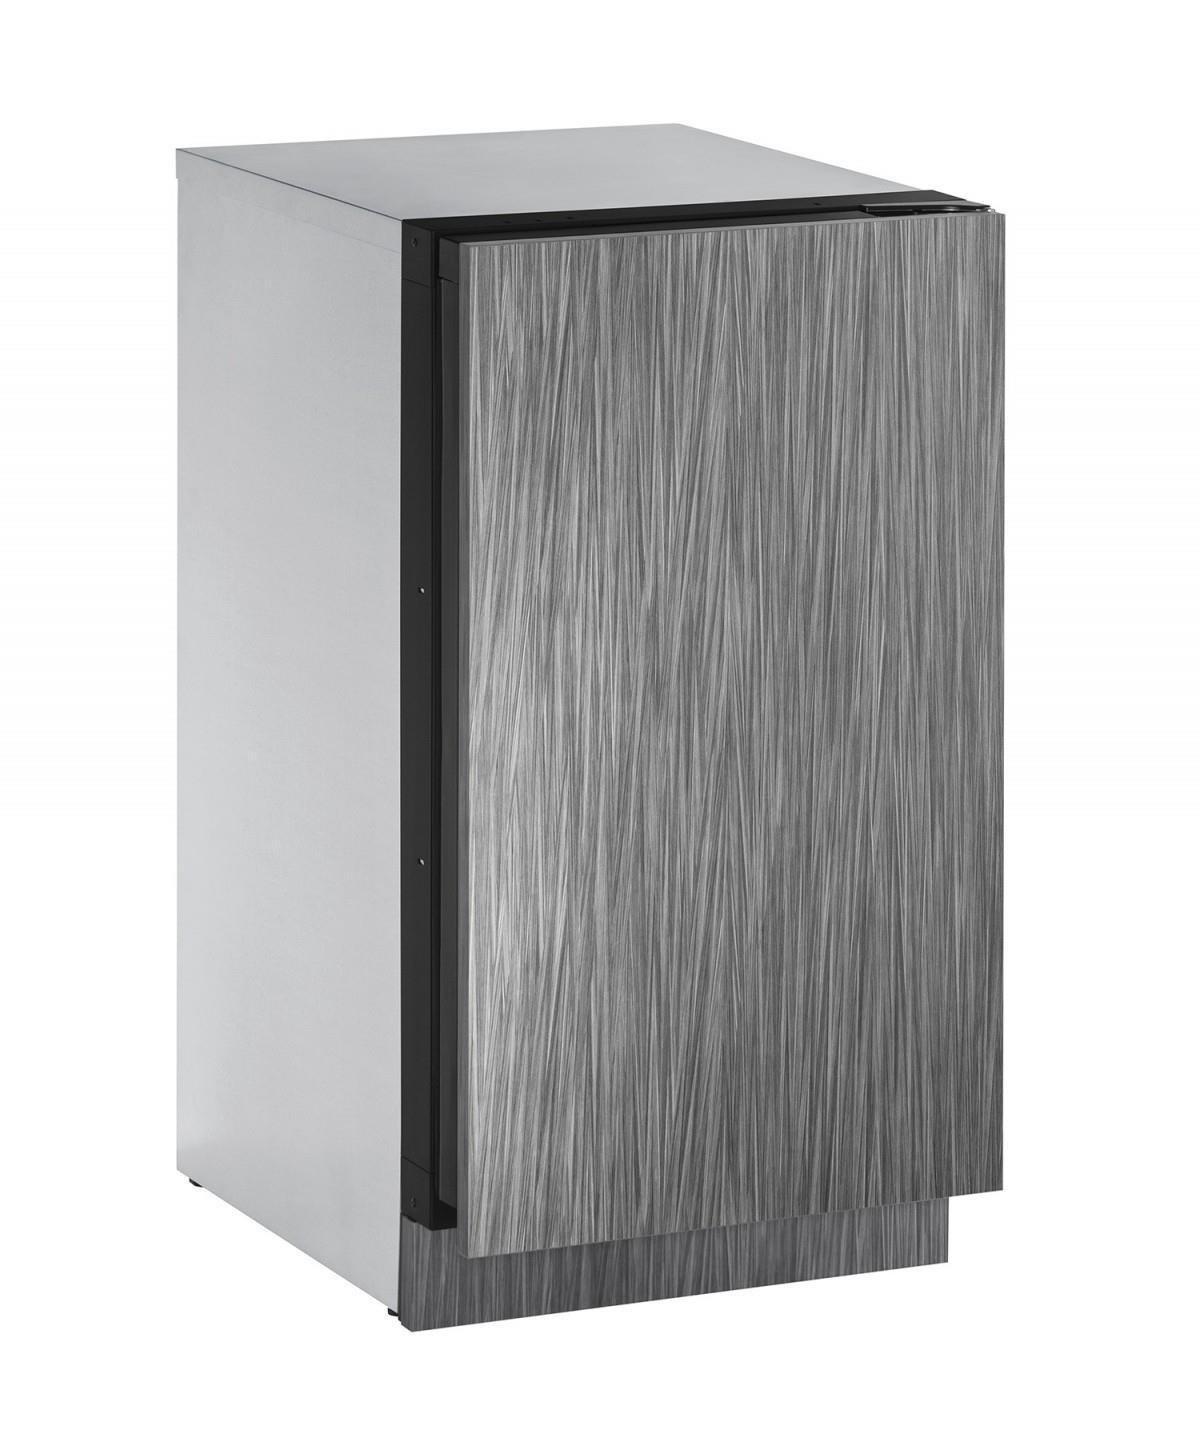 "U-Line Refrigerators 3.4 Cu. Ft. 18"" Compact All-Refrigerator - Item Number: U-2218RINT-00A"